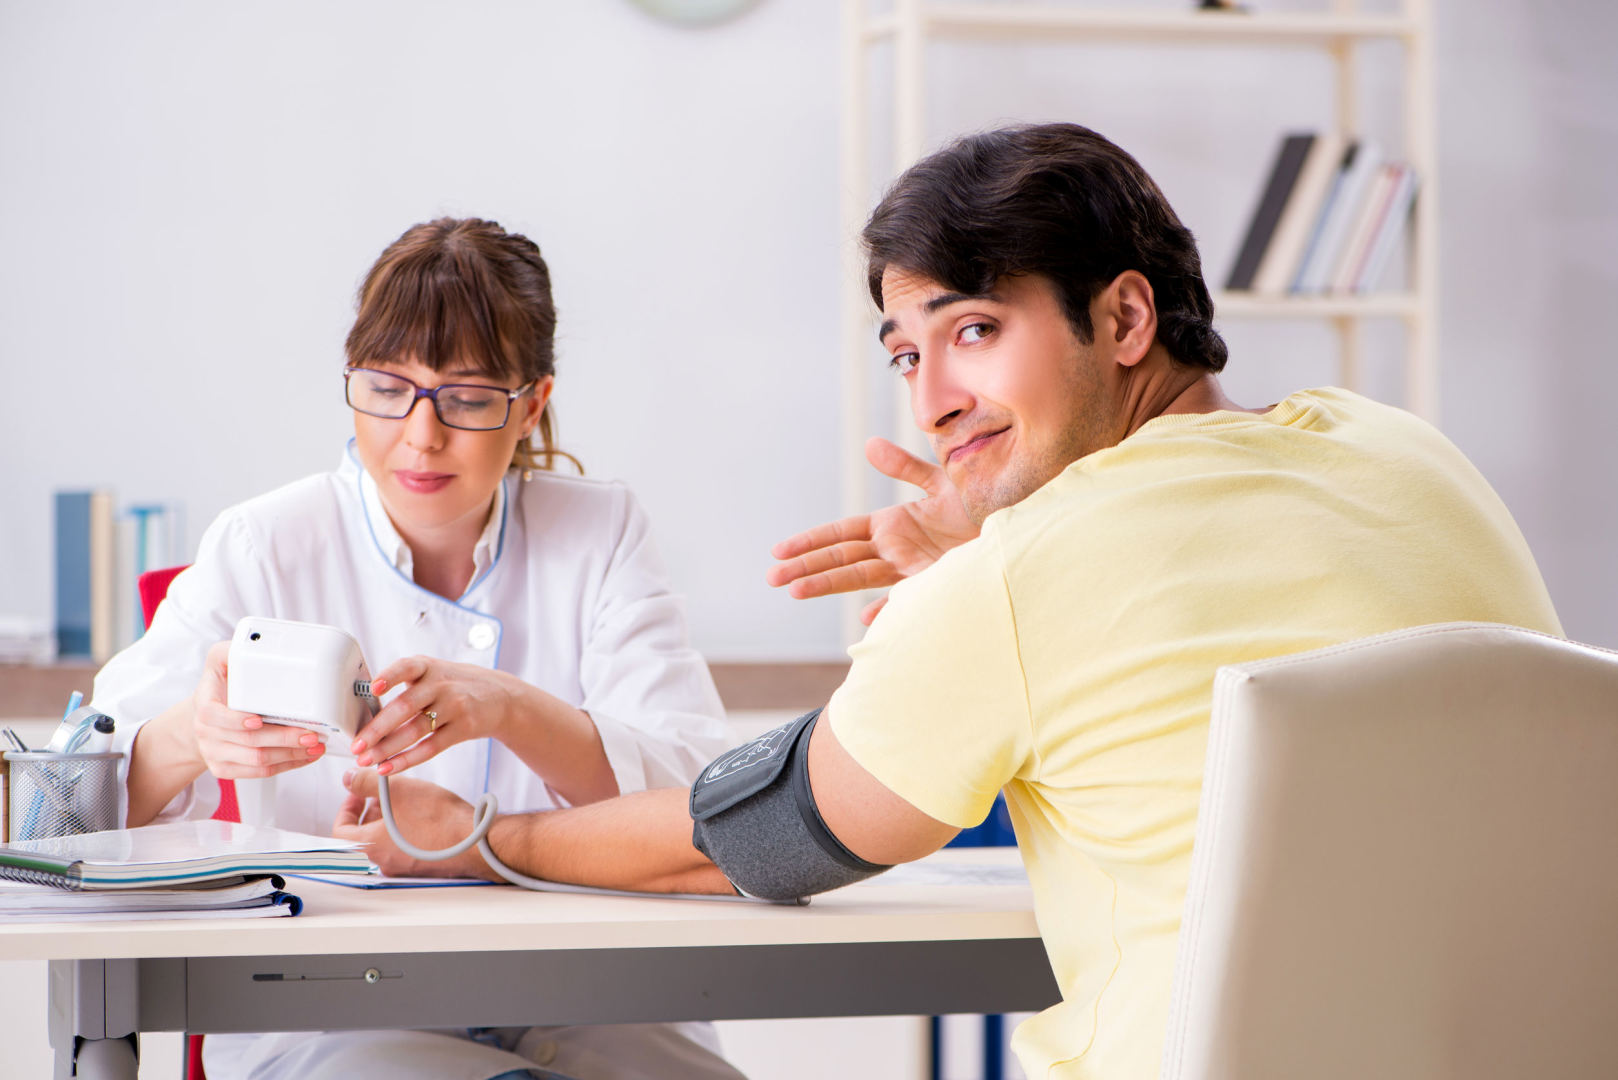 sergant hipertenzija, žemesniu širdies spaudimu hipertenzija akių edema